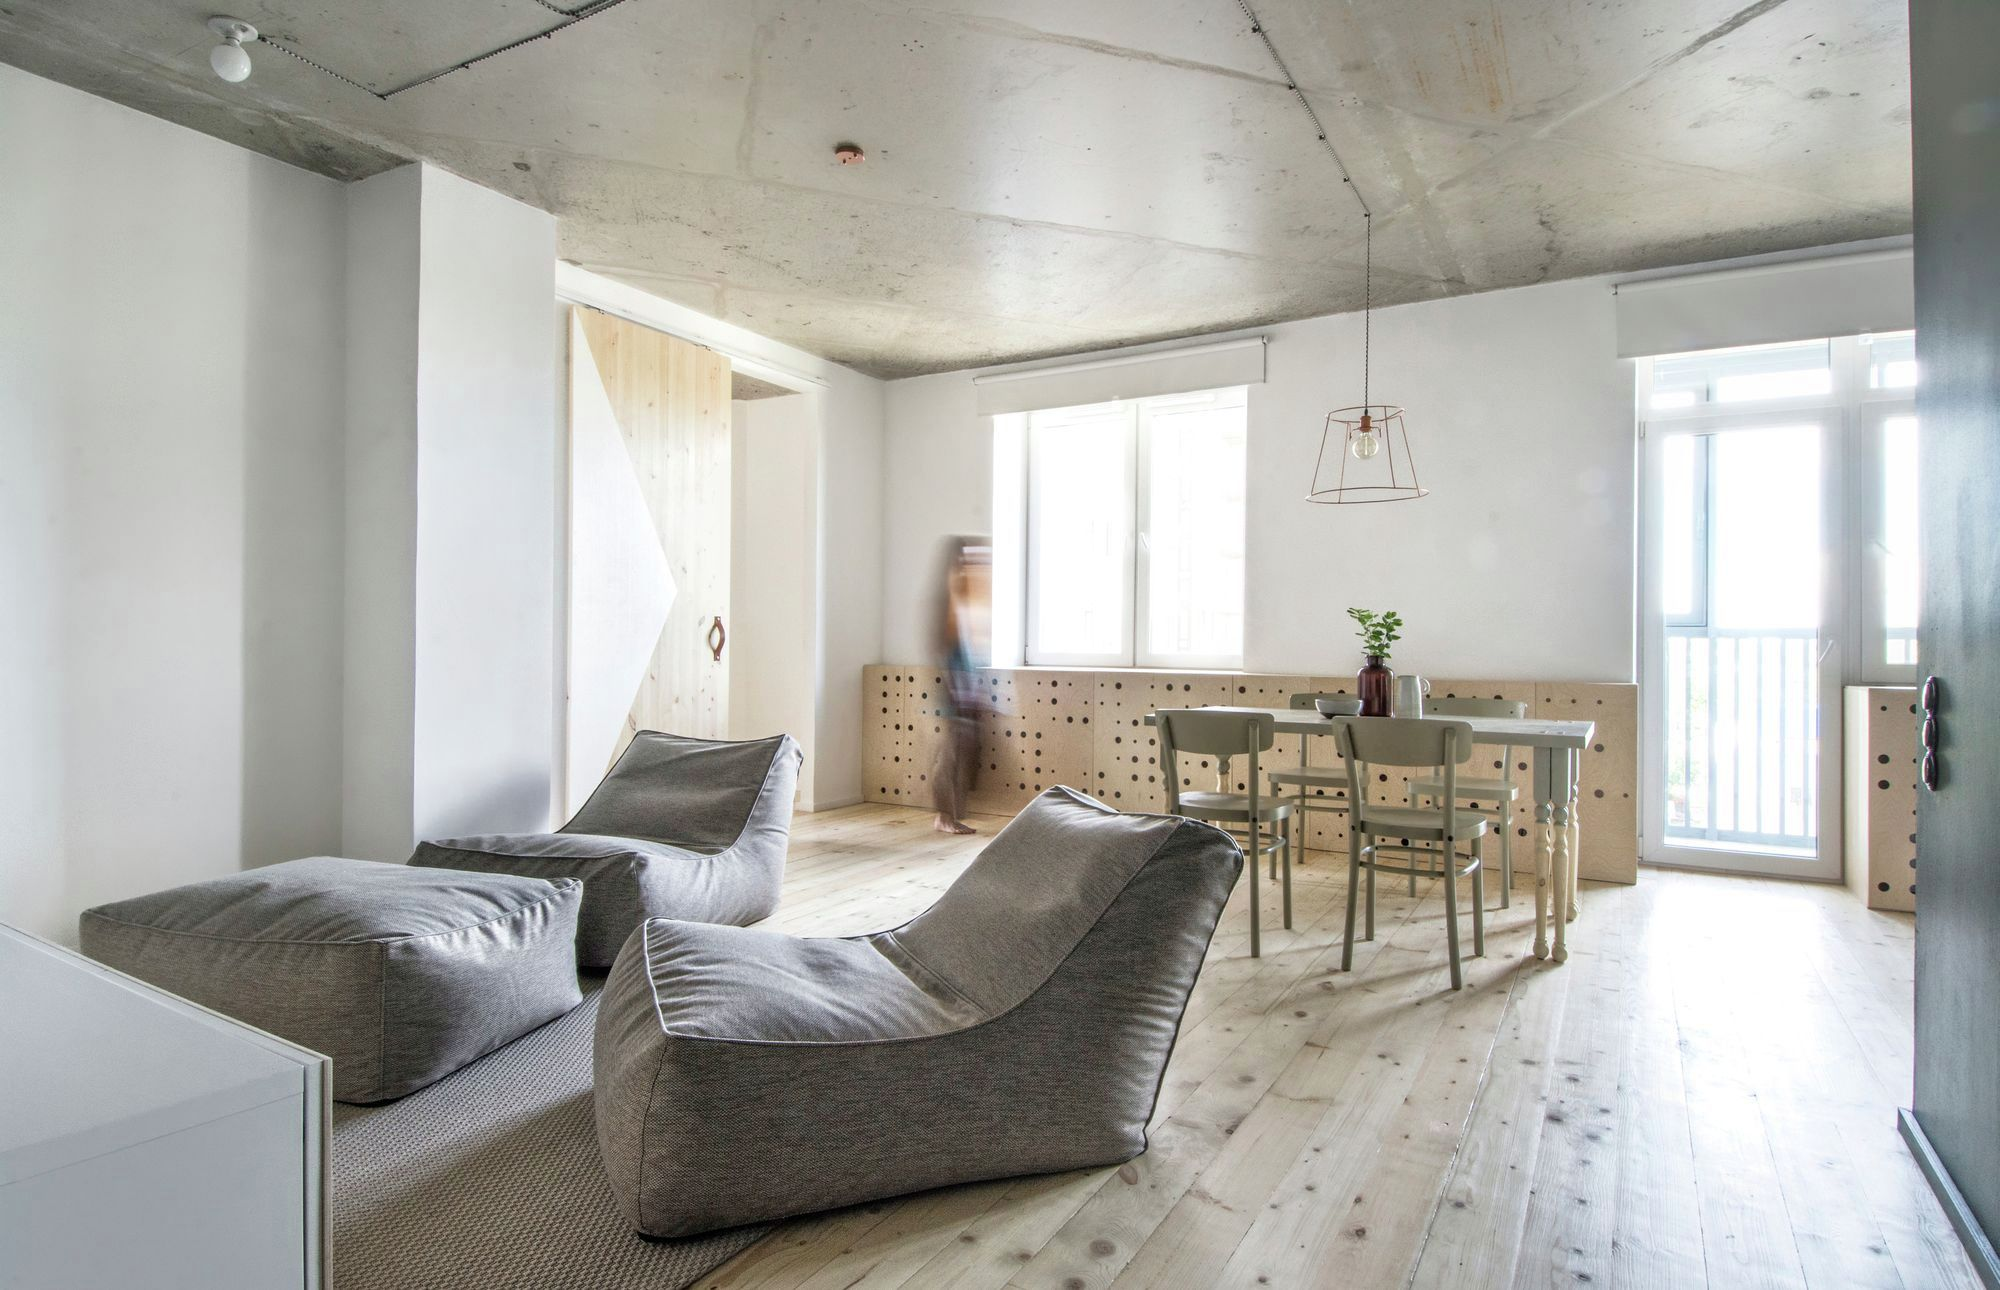 Appartamenti Parigi Vendita